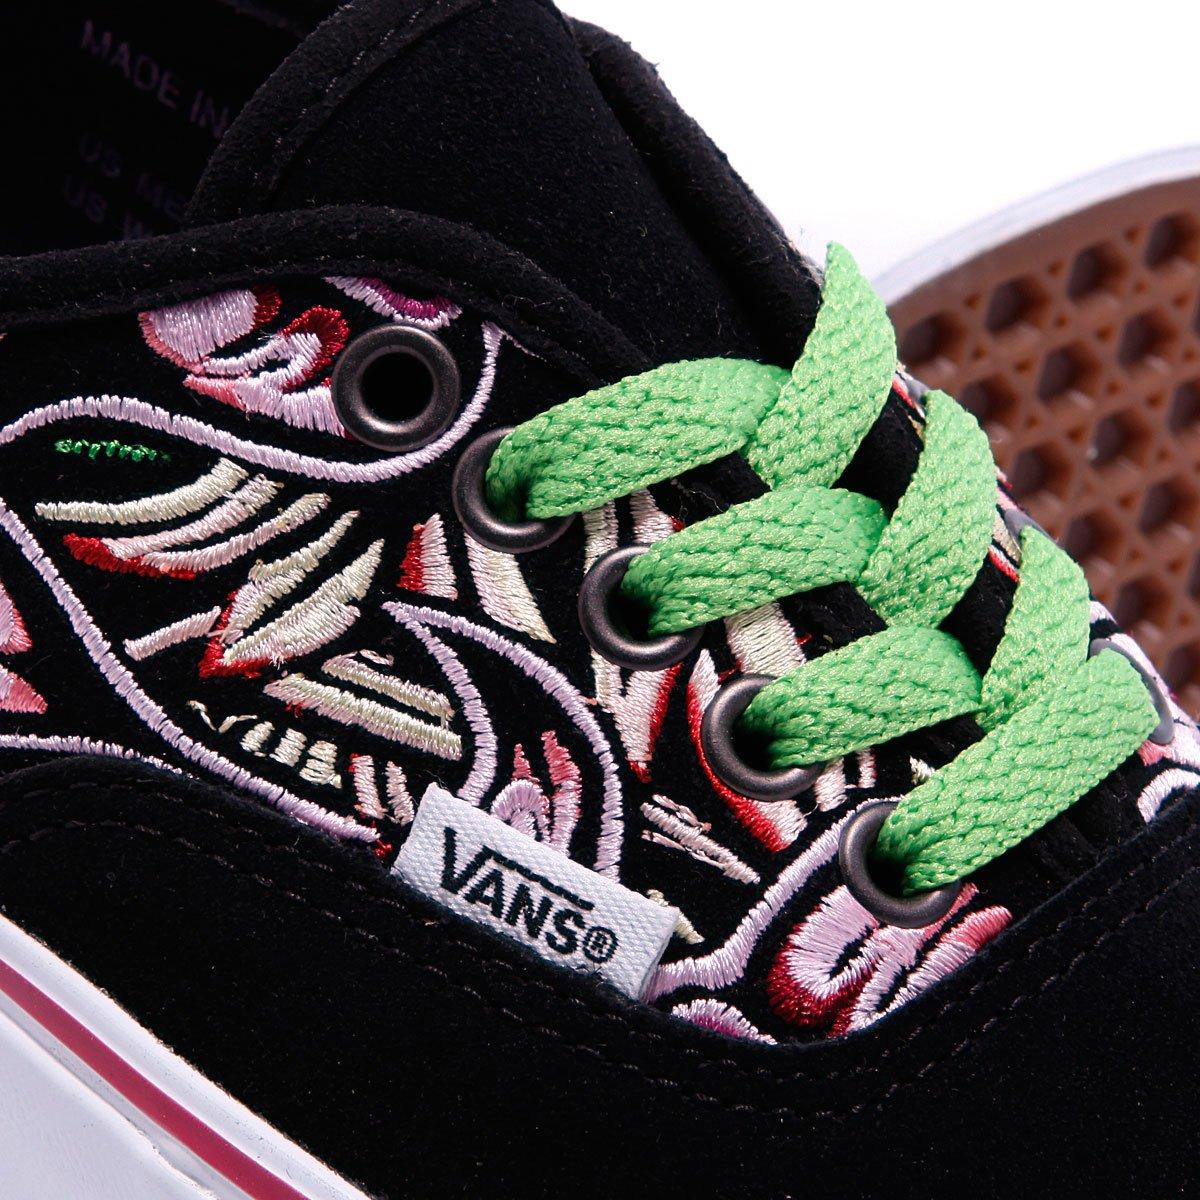 57ad0c82d44d Купить кеды Vans Authentic Lx Jungle Embroidery Black/White/Rosebud ...